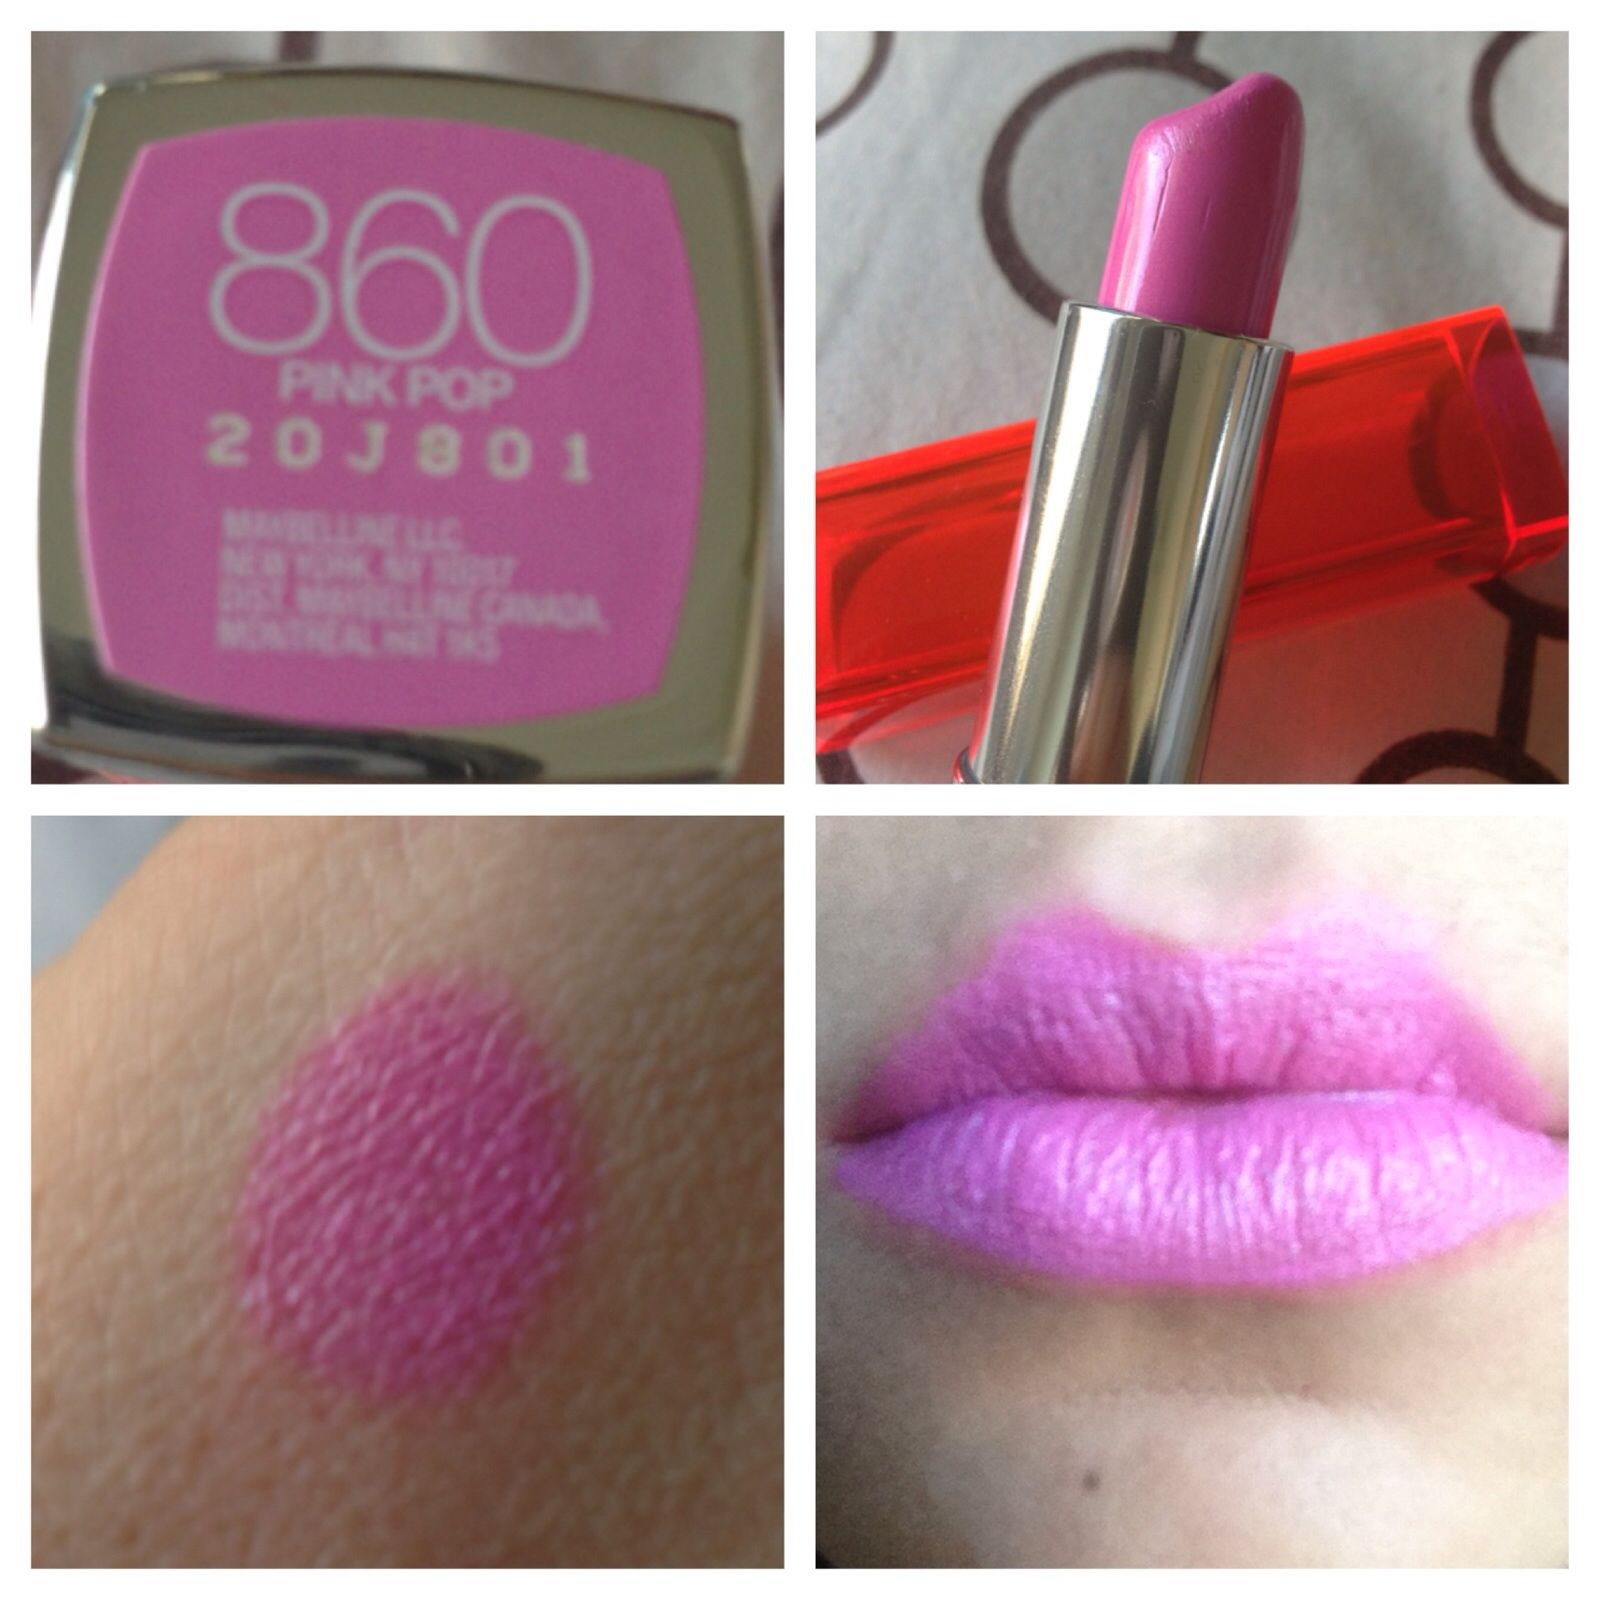 Maybelline Pink Pop 860 Lipstick Makeup Pinterest Everbest Bjorka Handbag Hitam